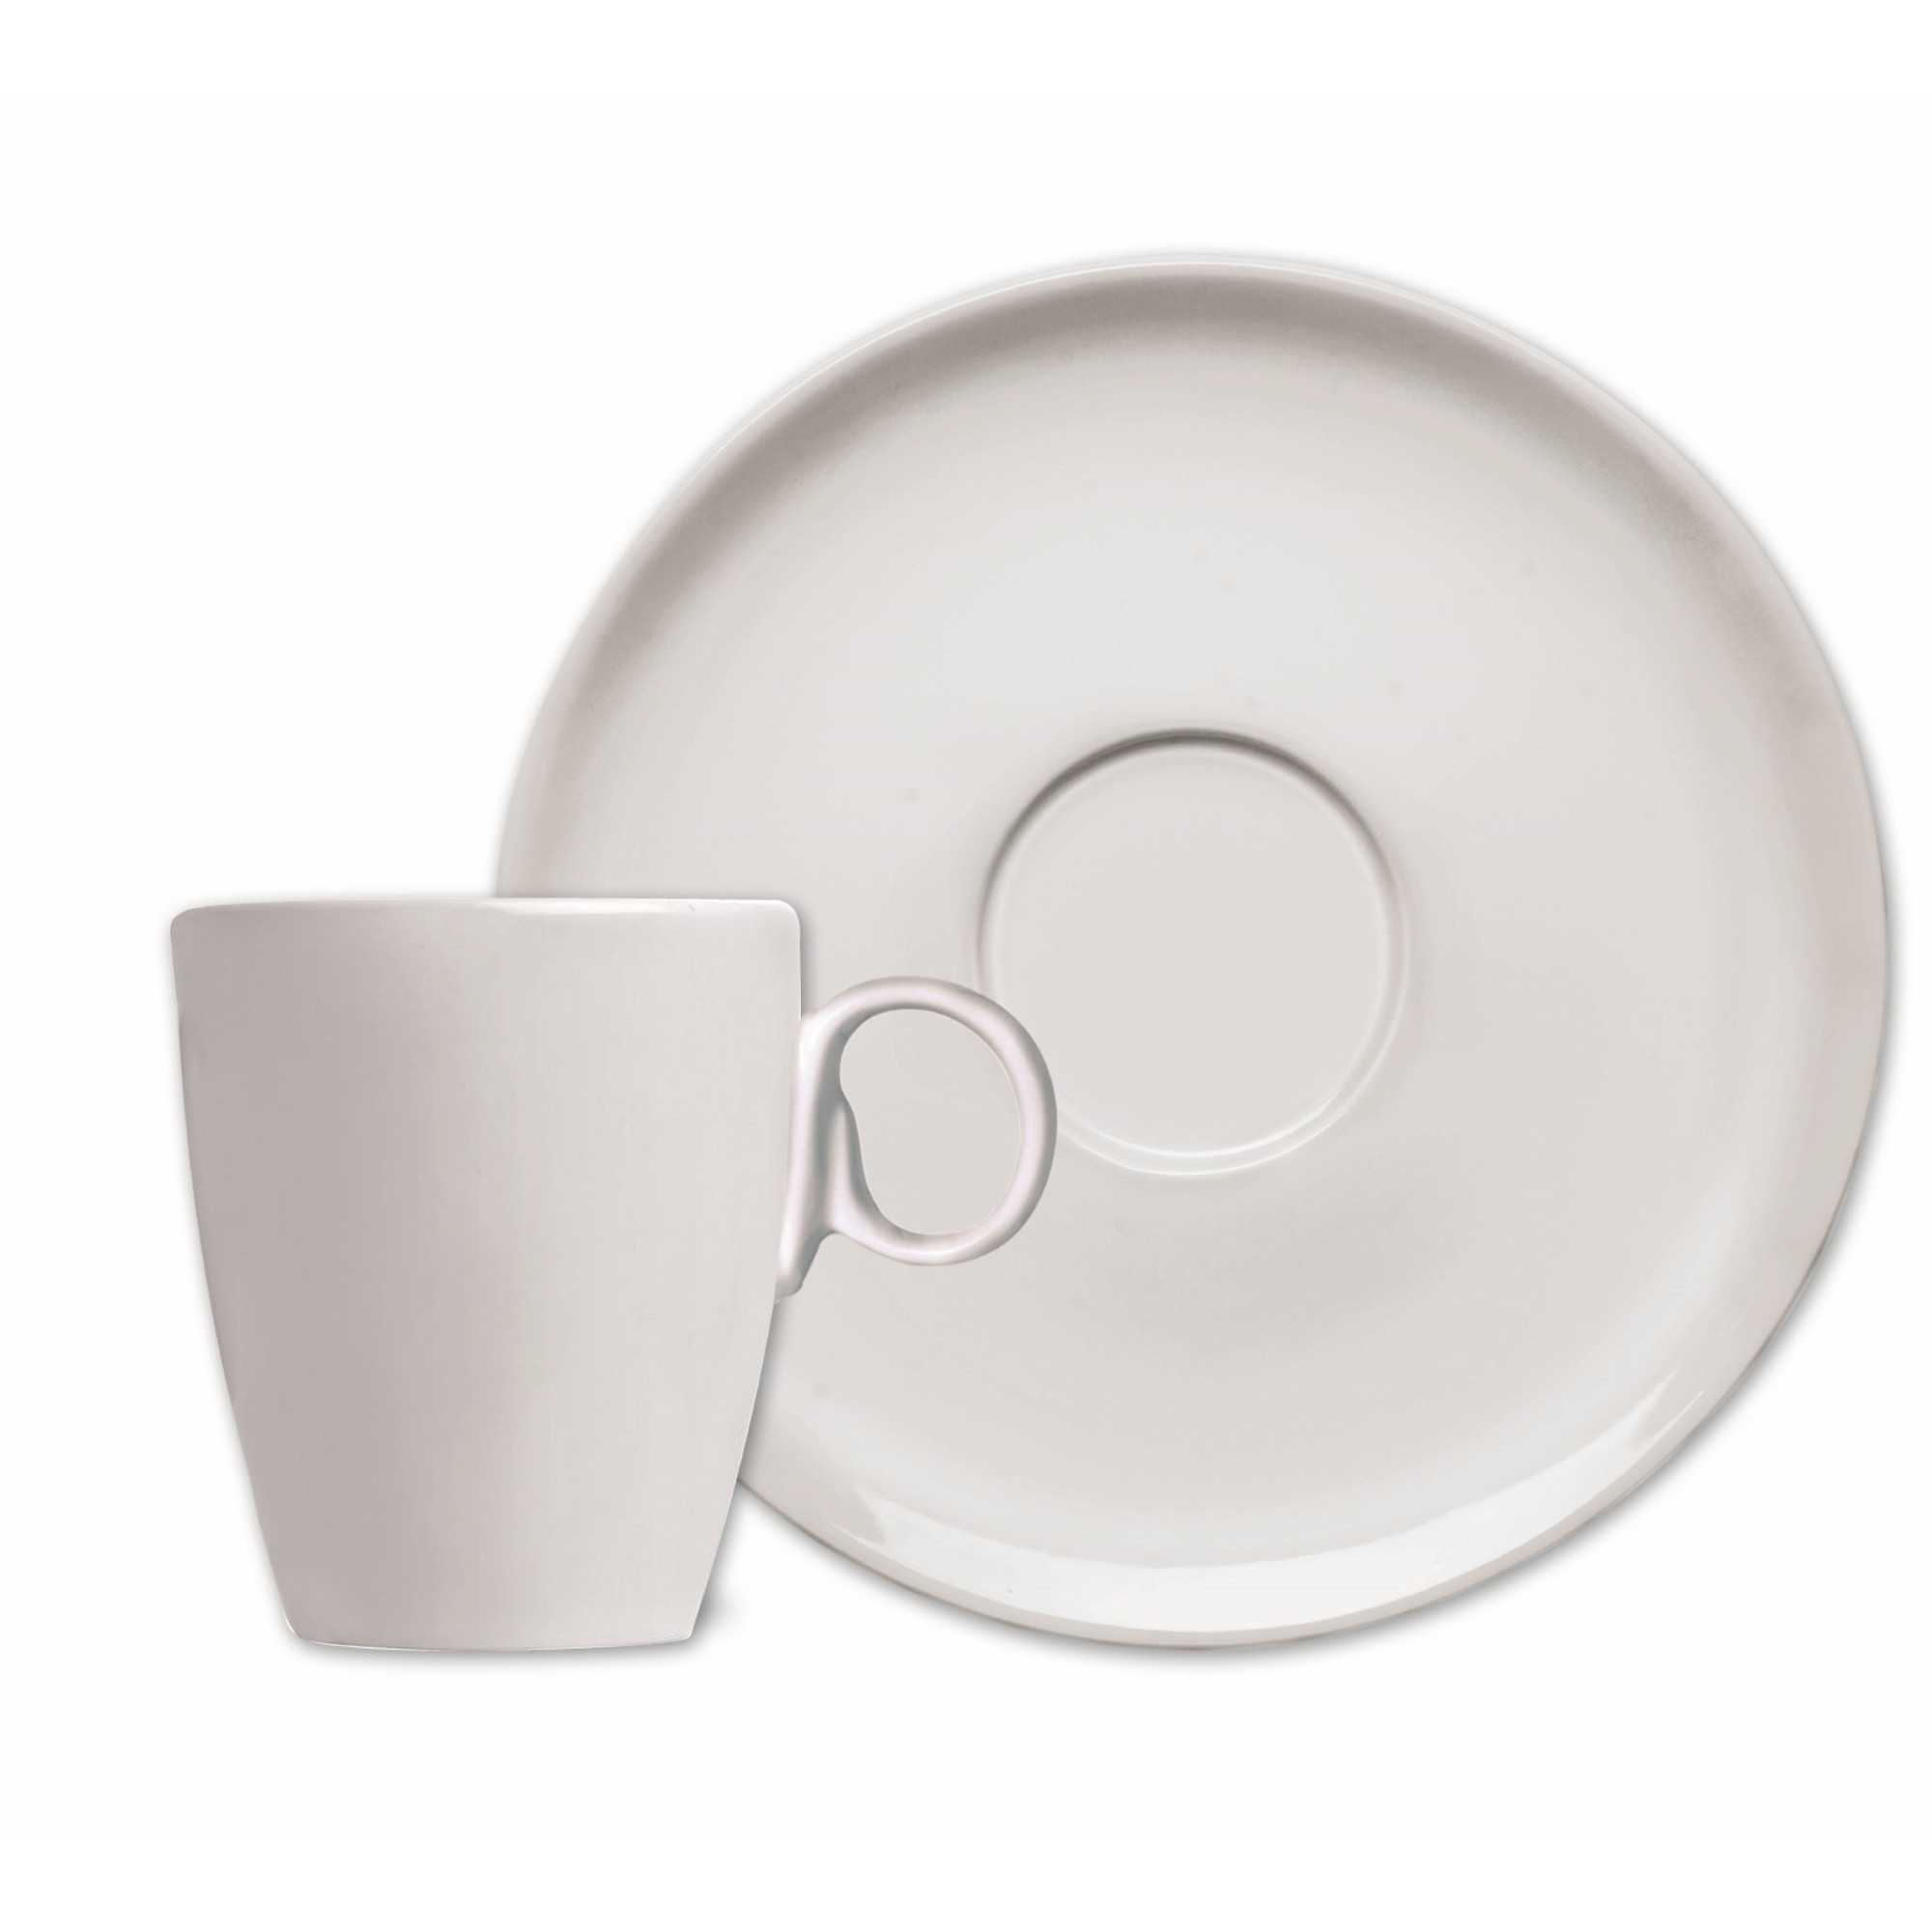 Xicara de Cha Holandesa de Porcelana 200ml com Pires - GermerCaixa de 12 un